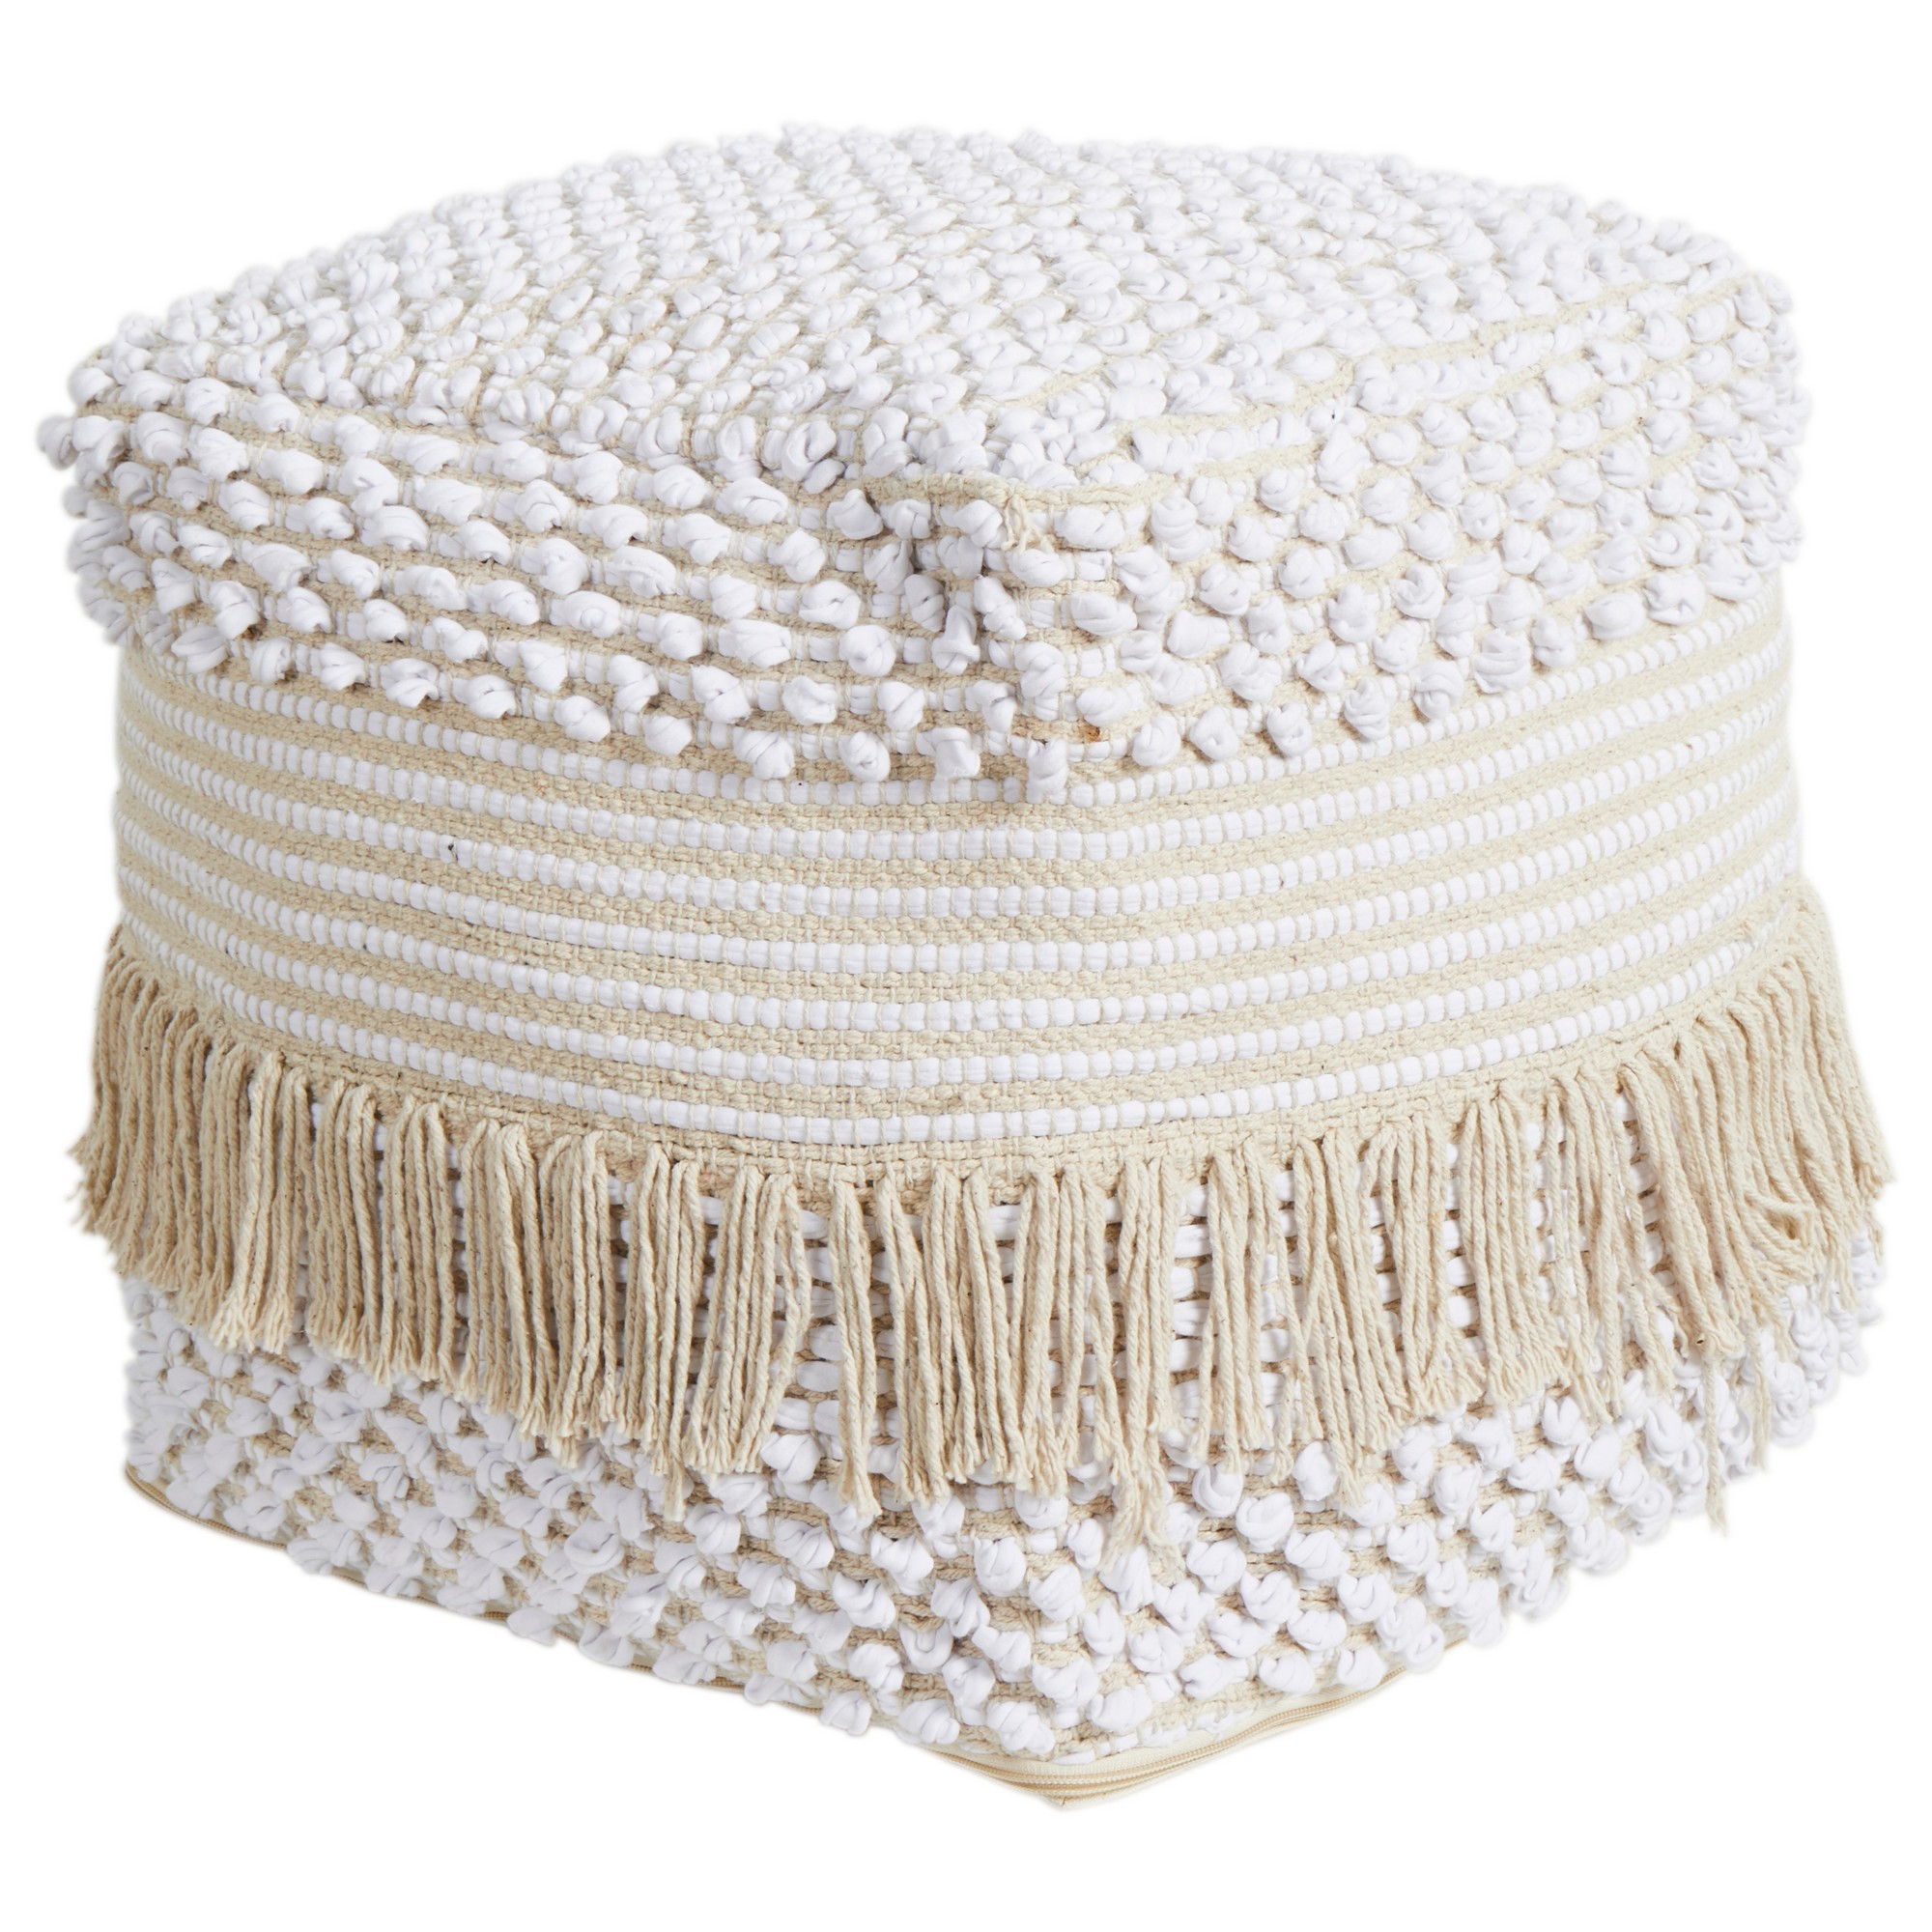 Kaya Handcrafted Cotton Ottoman